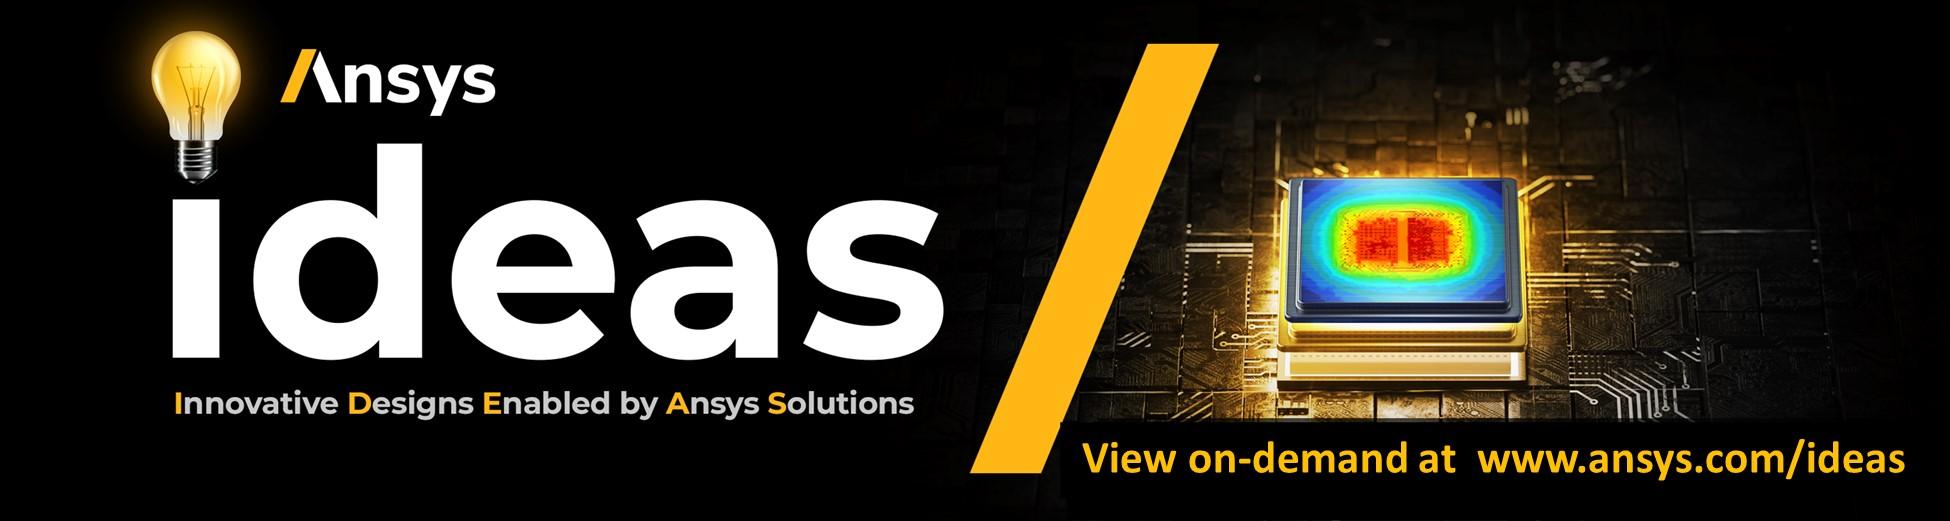 ANSYS IDEAS logo